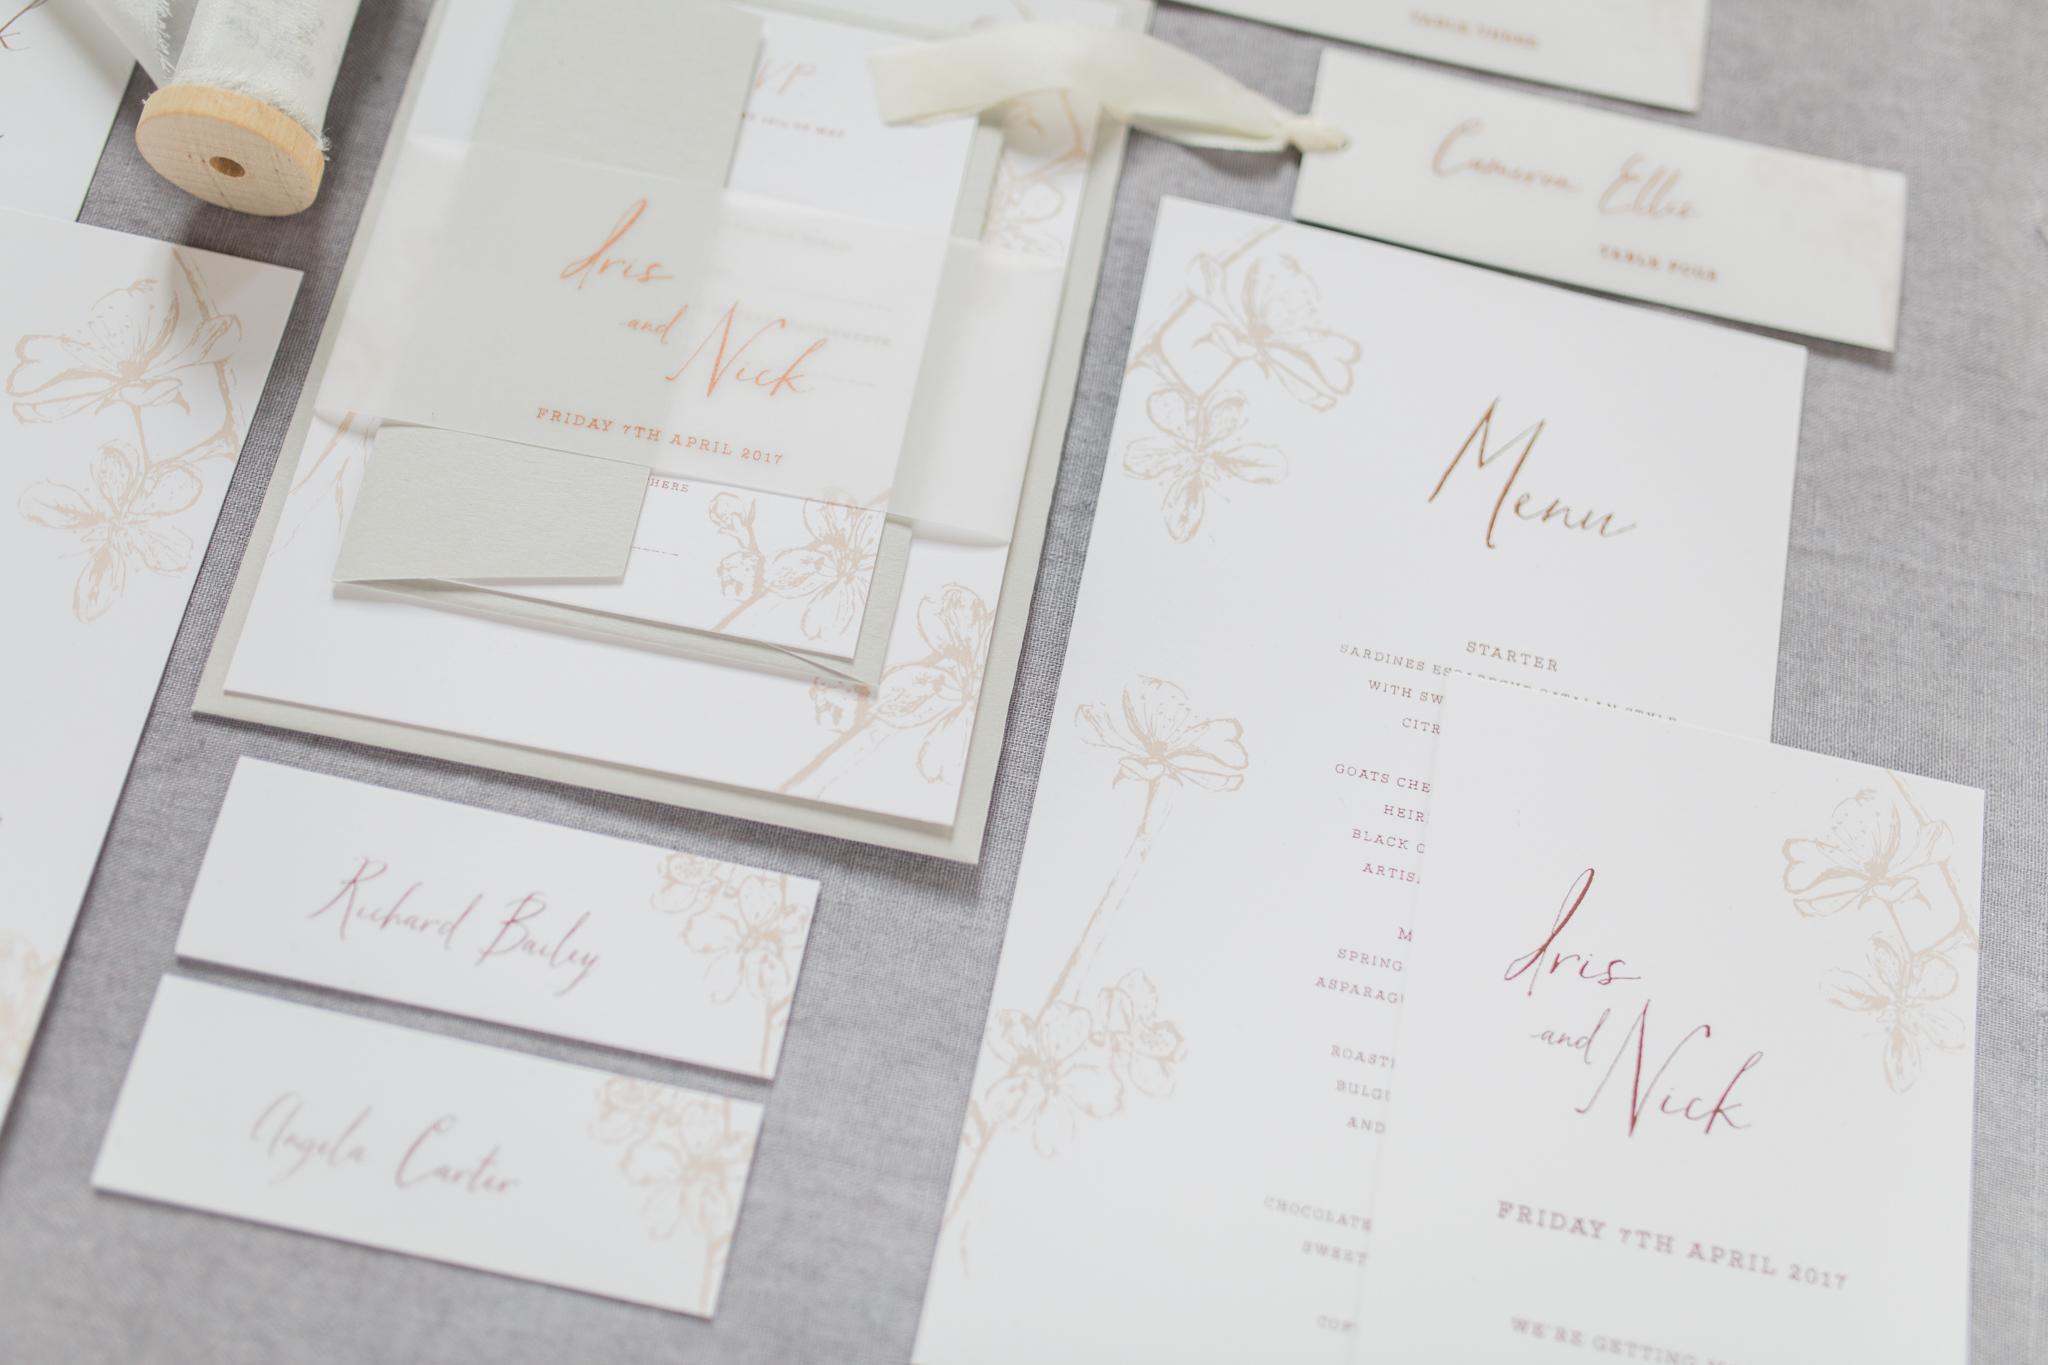 Inkflower Press Plum Blossom silkscreen printed wedding stationery suite - Copper Blush